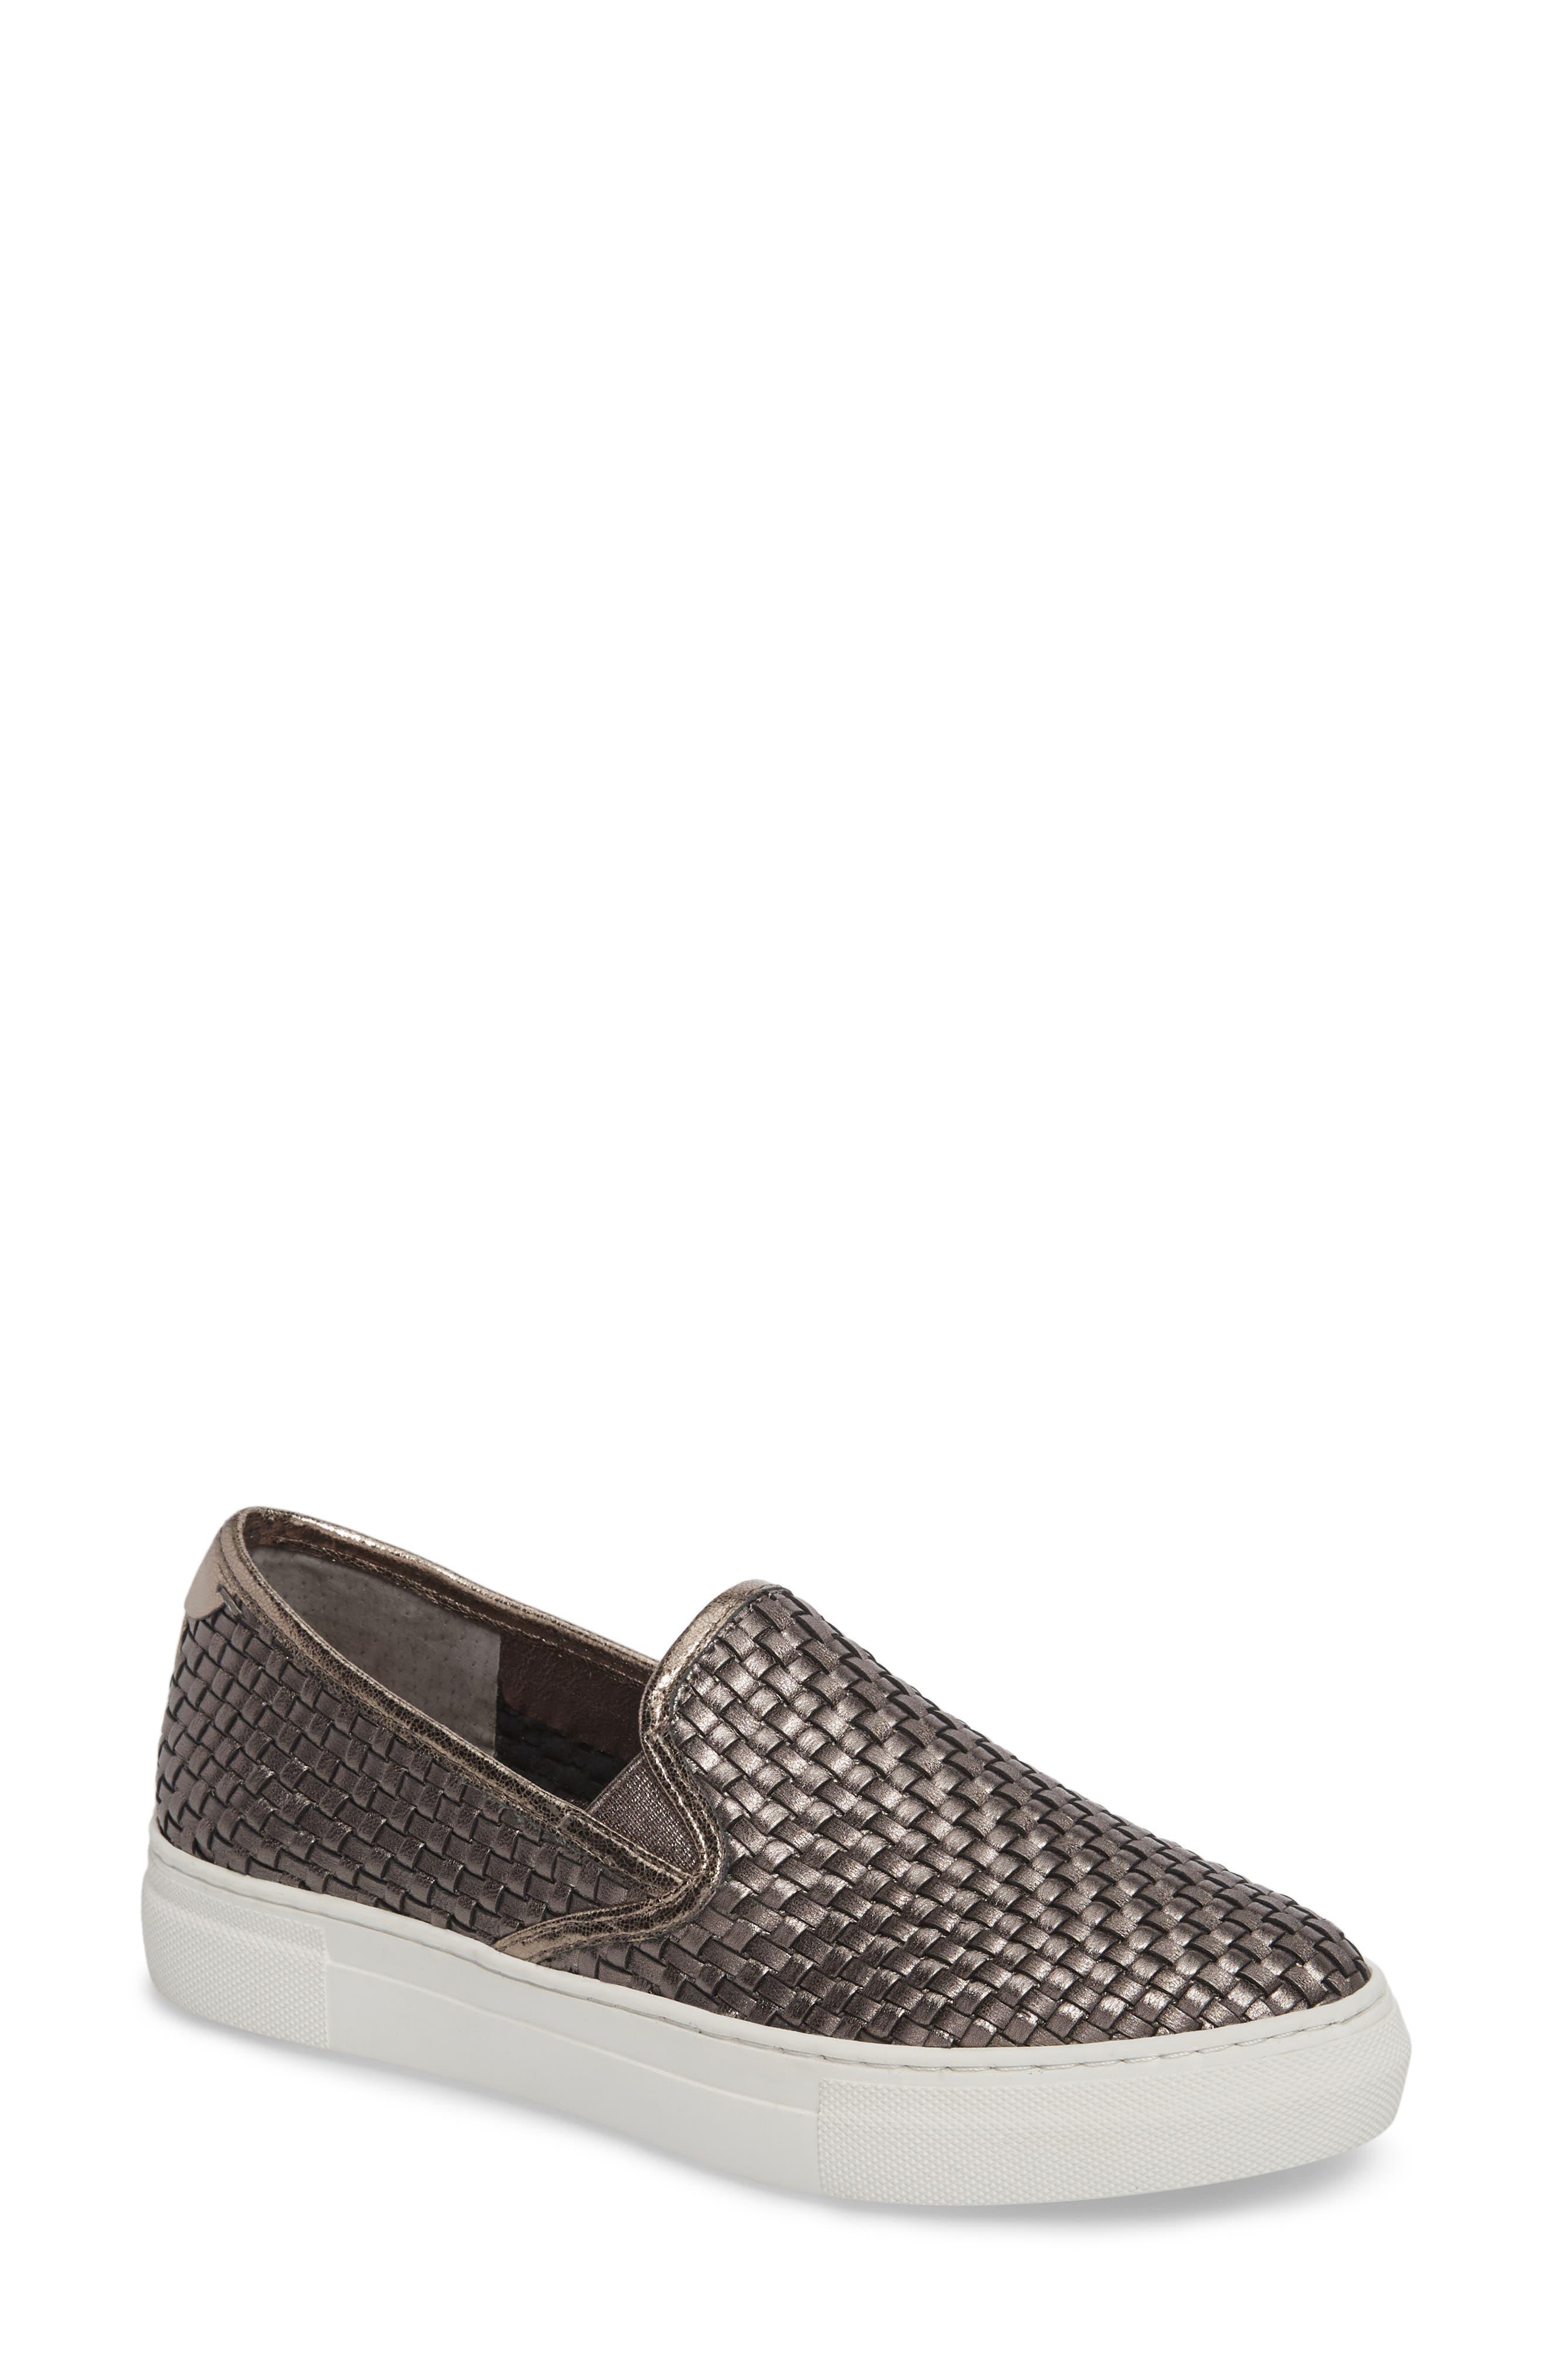 Flynn Slip-On Sneaker,                         Main,                         color, Pewter Leather